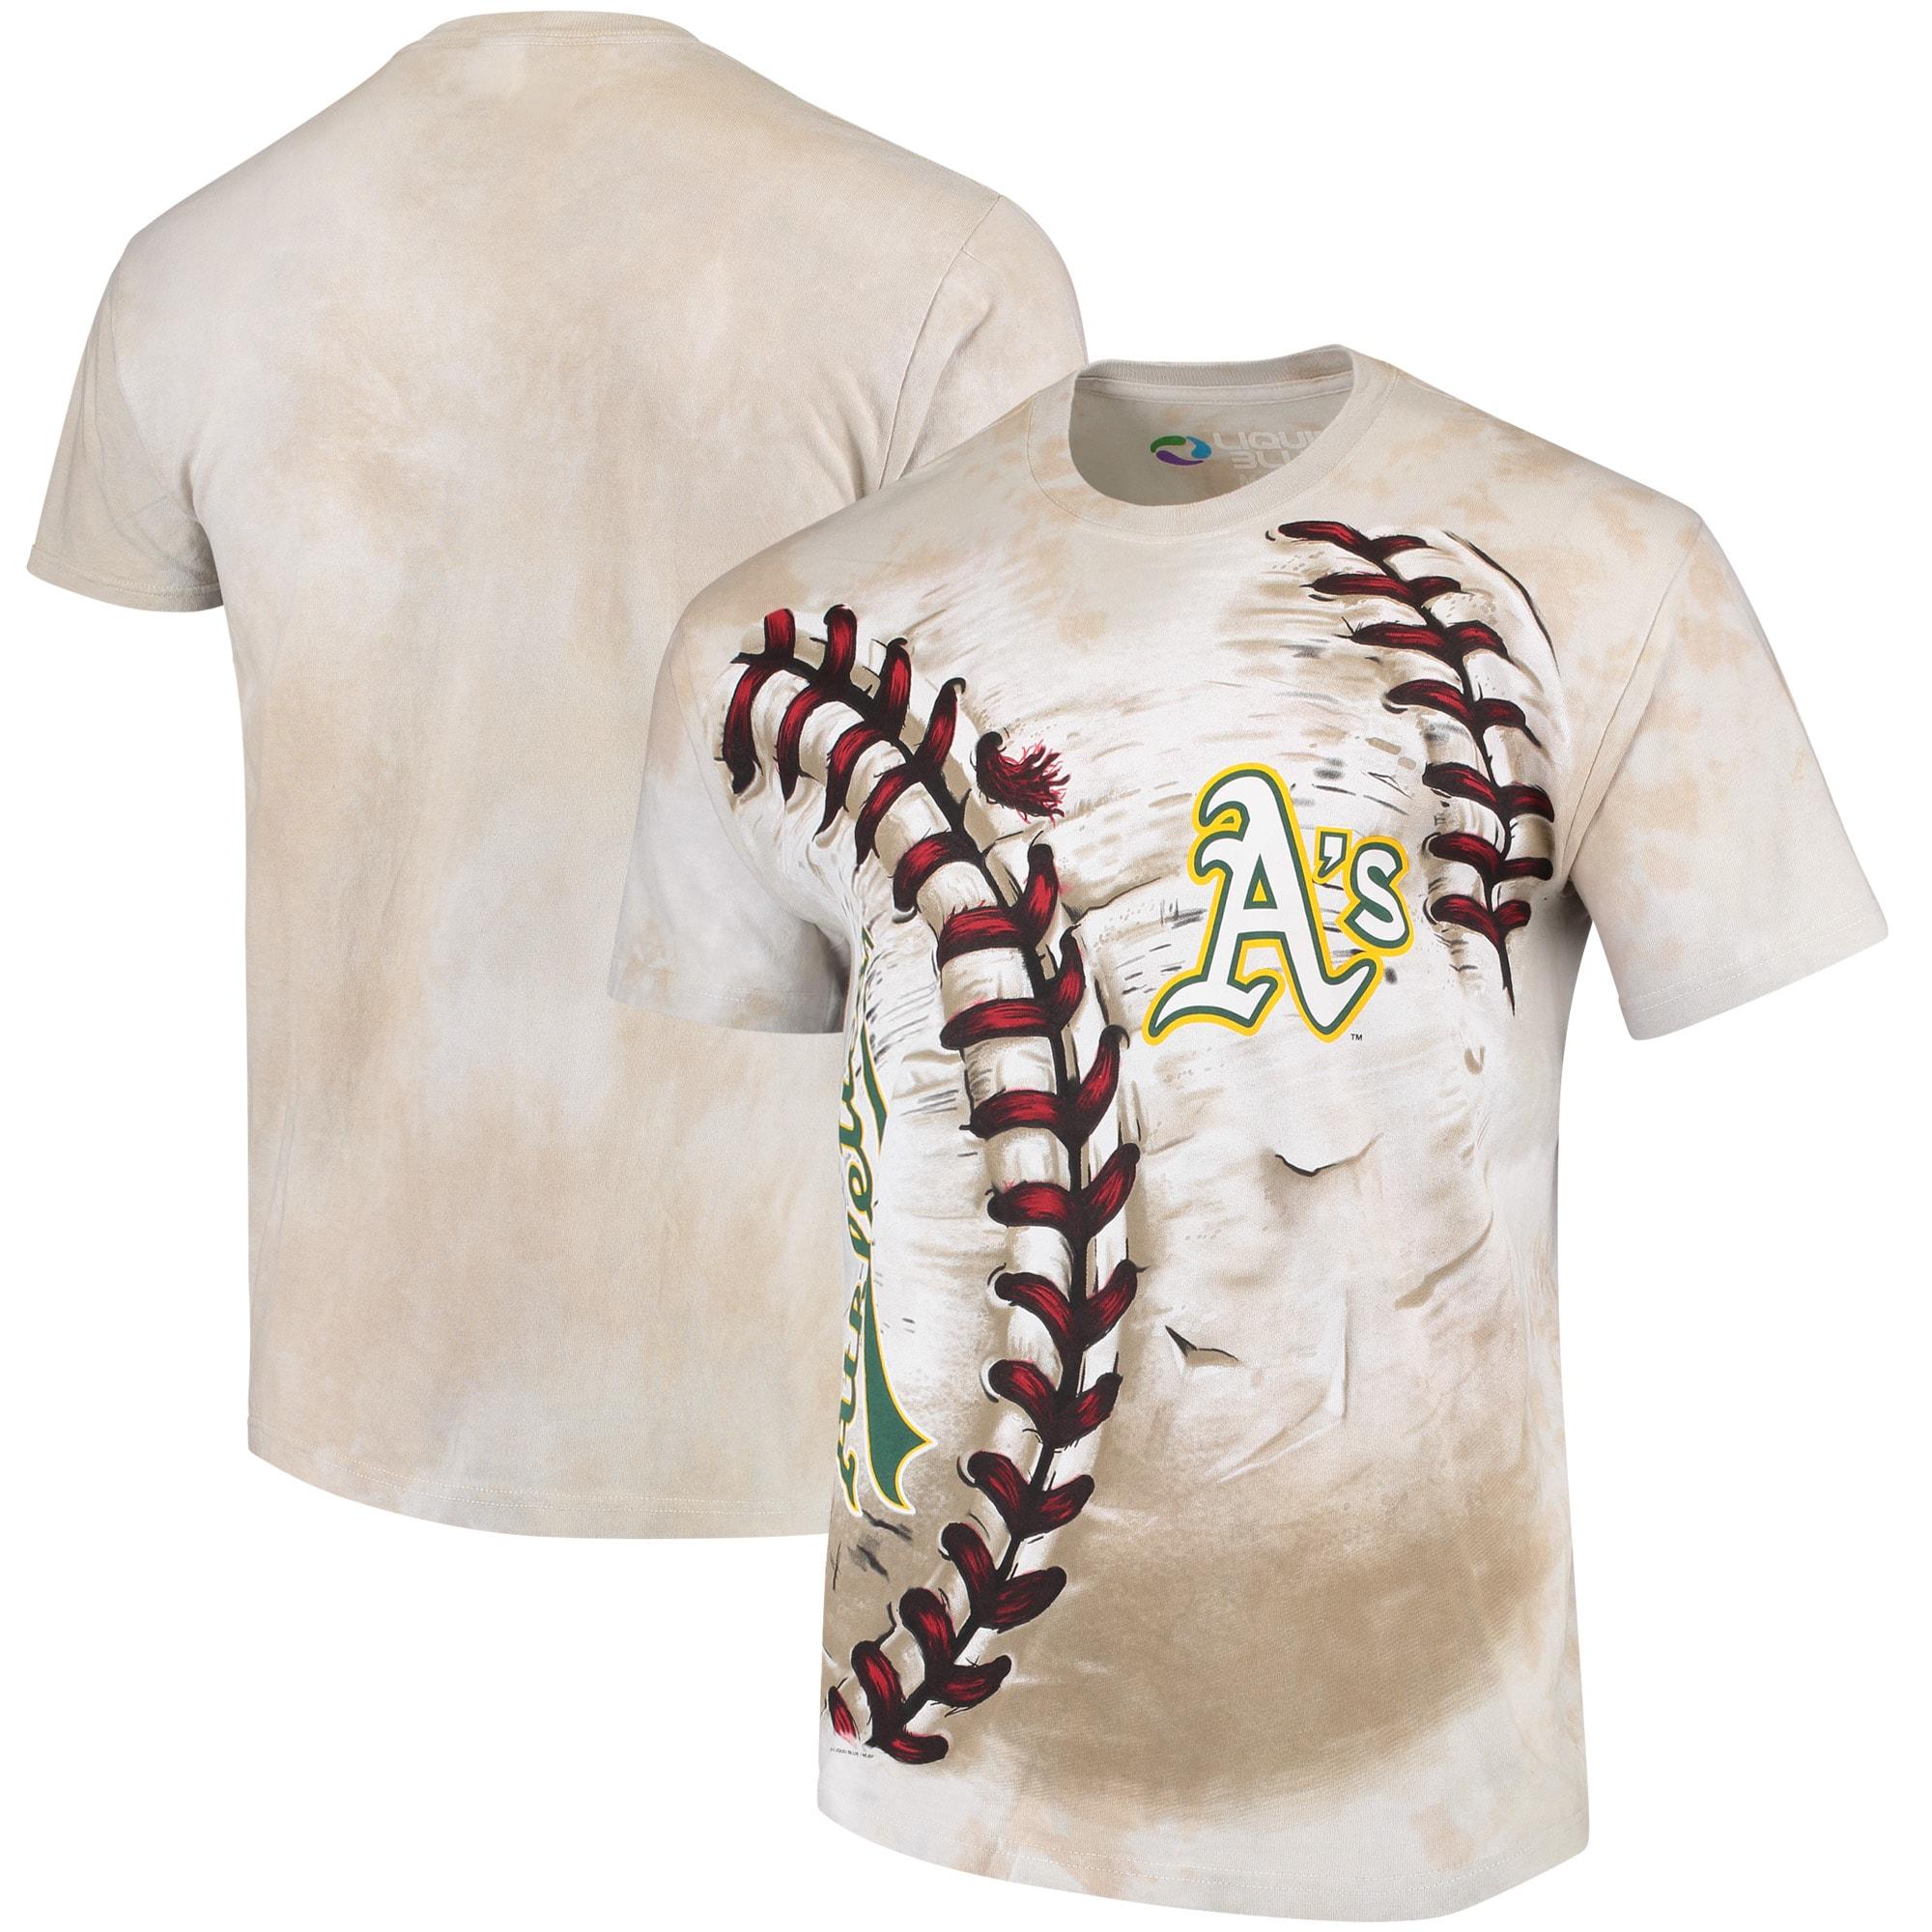 Oakland Athletics Hardball Tie-Dye T- Shirt - Cream